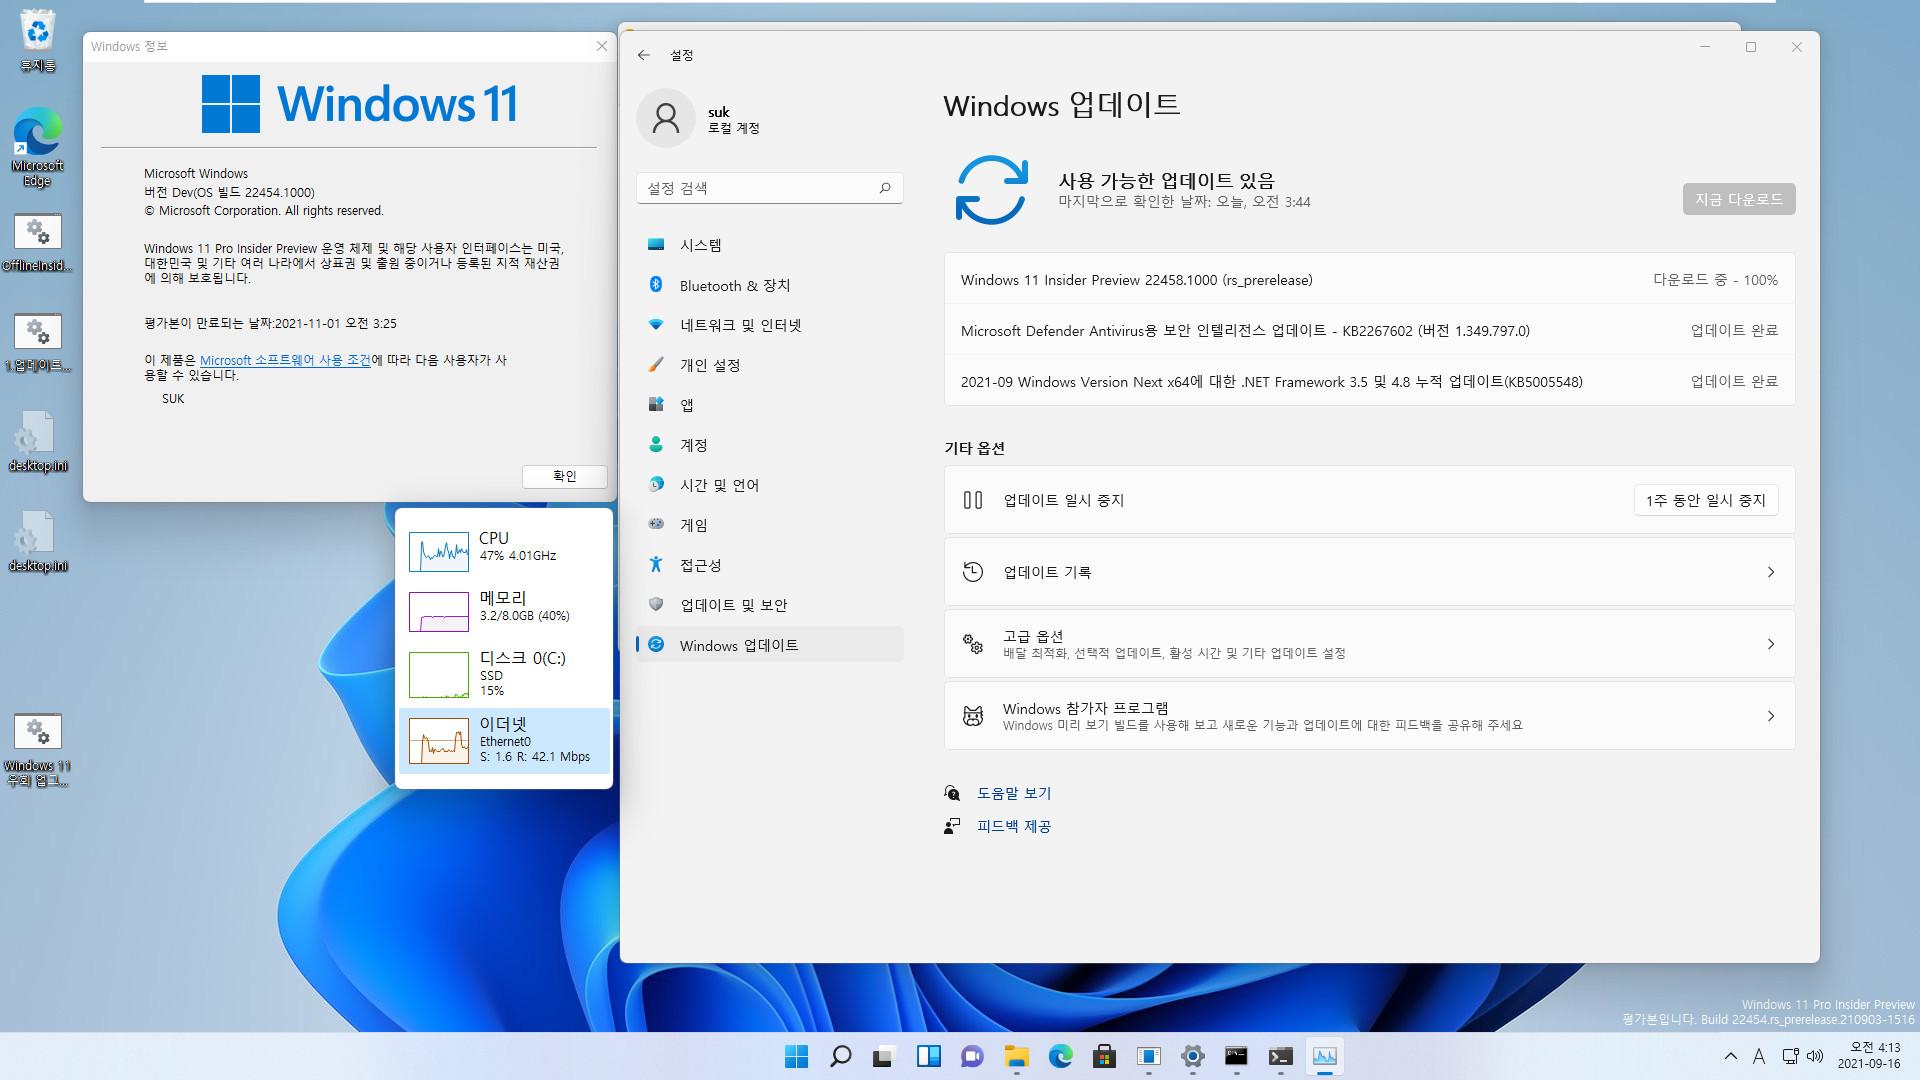 Windows 11 인사이더 프리뷰 - 버전 Dev (OS 빌드 22458.1000) 나왔네요 - 개발자 채널 - uup 사이트 2군데 전부 한국어 iso가 install.wim 단계에서 오류가 생겨서 윈도우 업데이트에서 uup 파일들 다운로드하여 iso 만드는데 성공했습니다 2021-09-16_041359.jpg